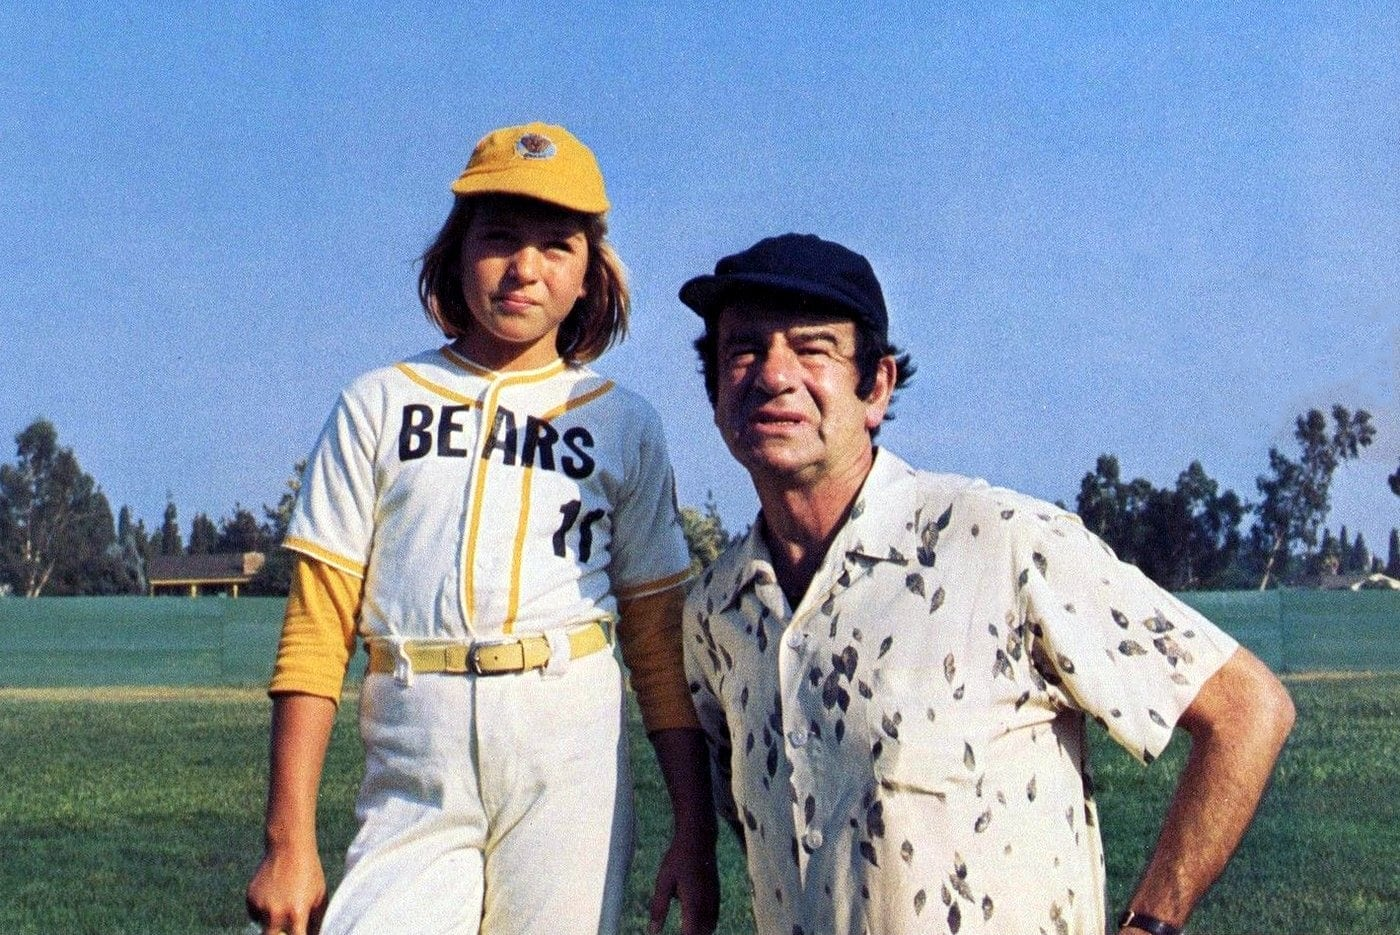 The Bad News Bears, the original '70s movie starring Tatum O'Neal & Walter Matthau